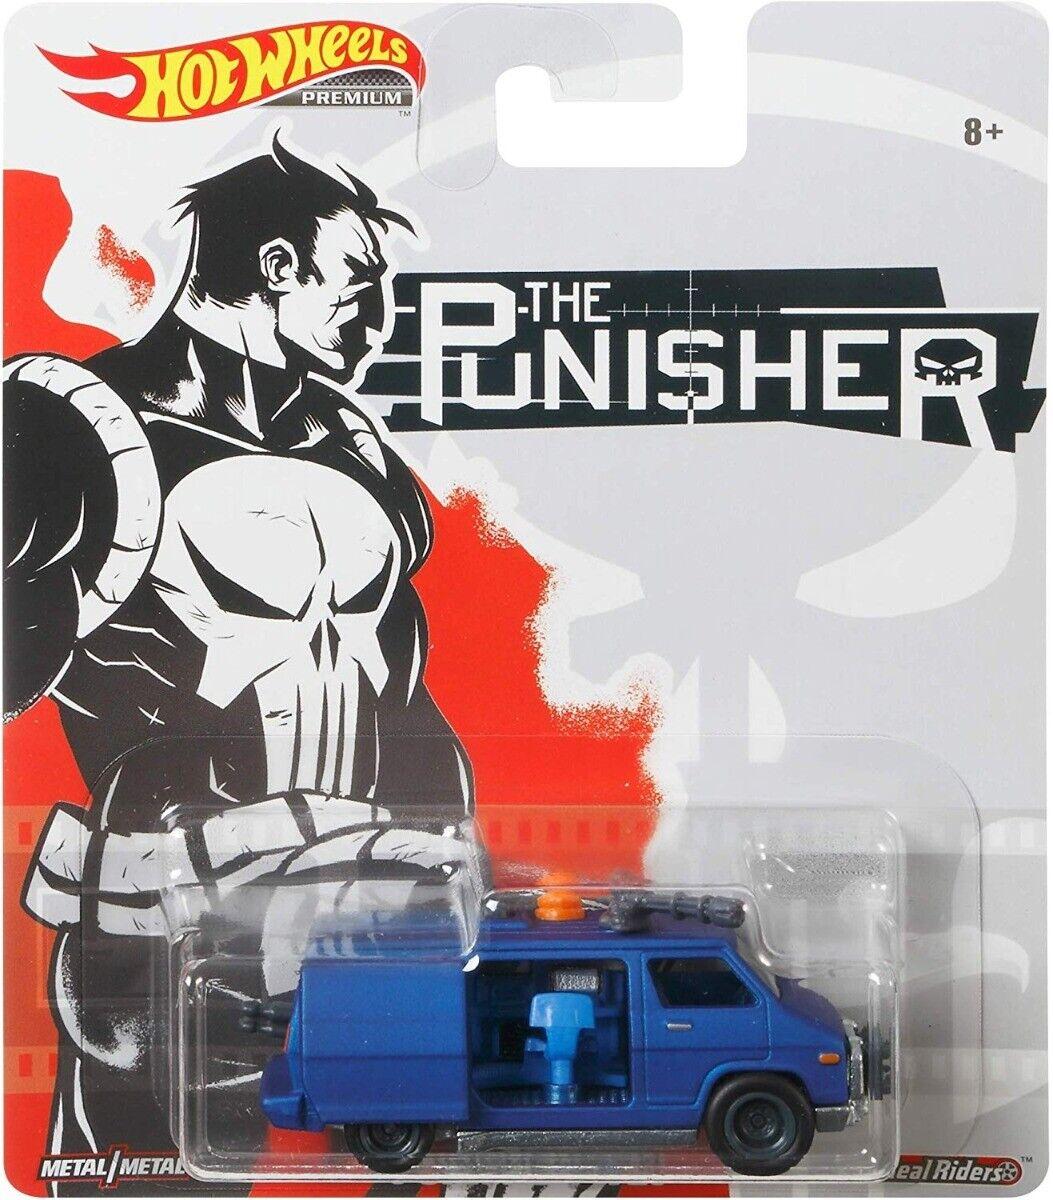 Retro Entertainment 1:64 Hot Wheels GJR46 DMC55 The Mystery Machine Scooby-Doo